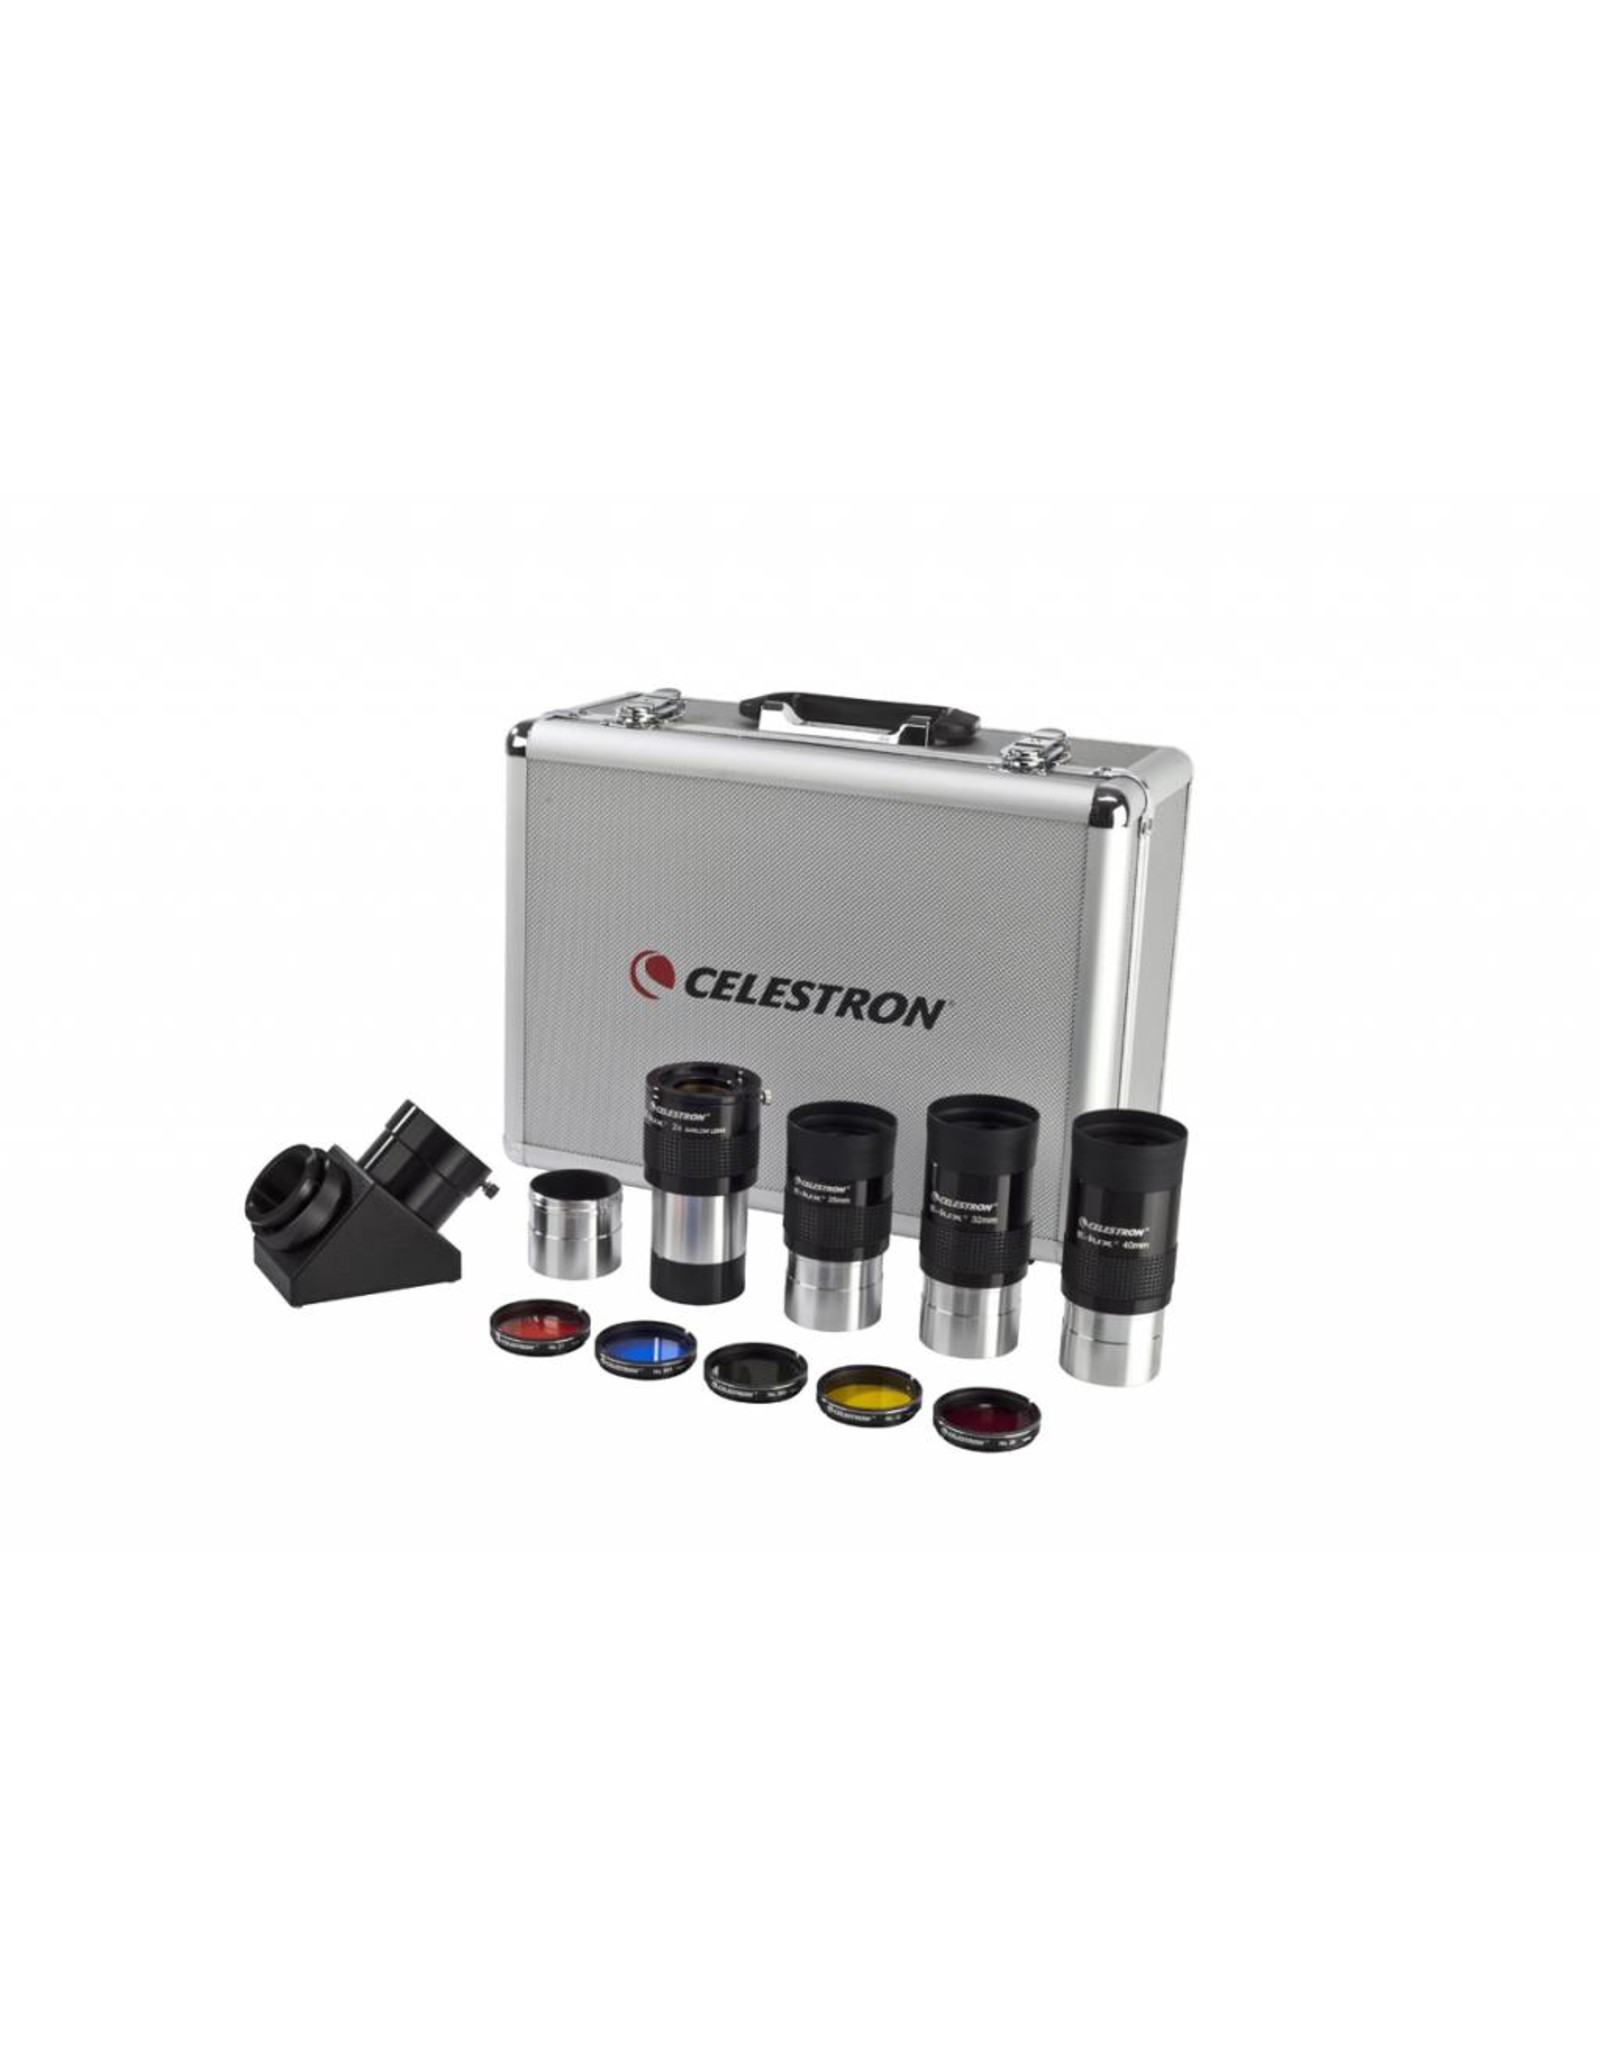 Celestron Celestron 2 Inch Eyepiece & Filter Accessory Kit